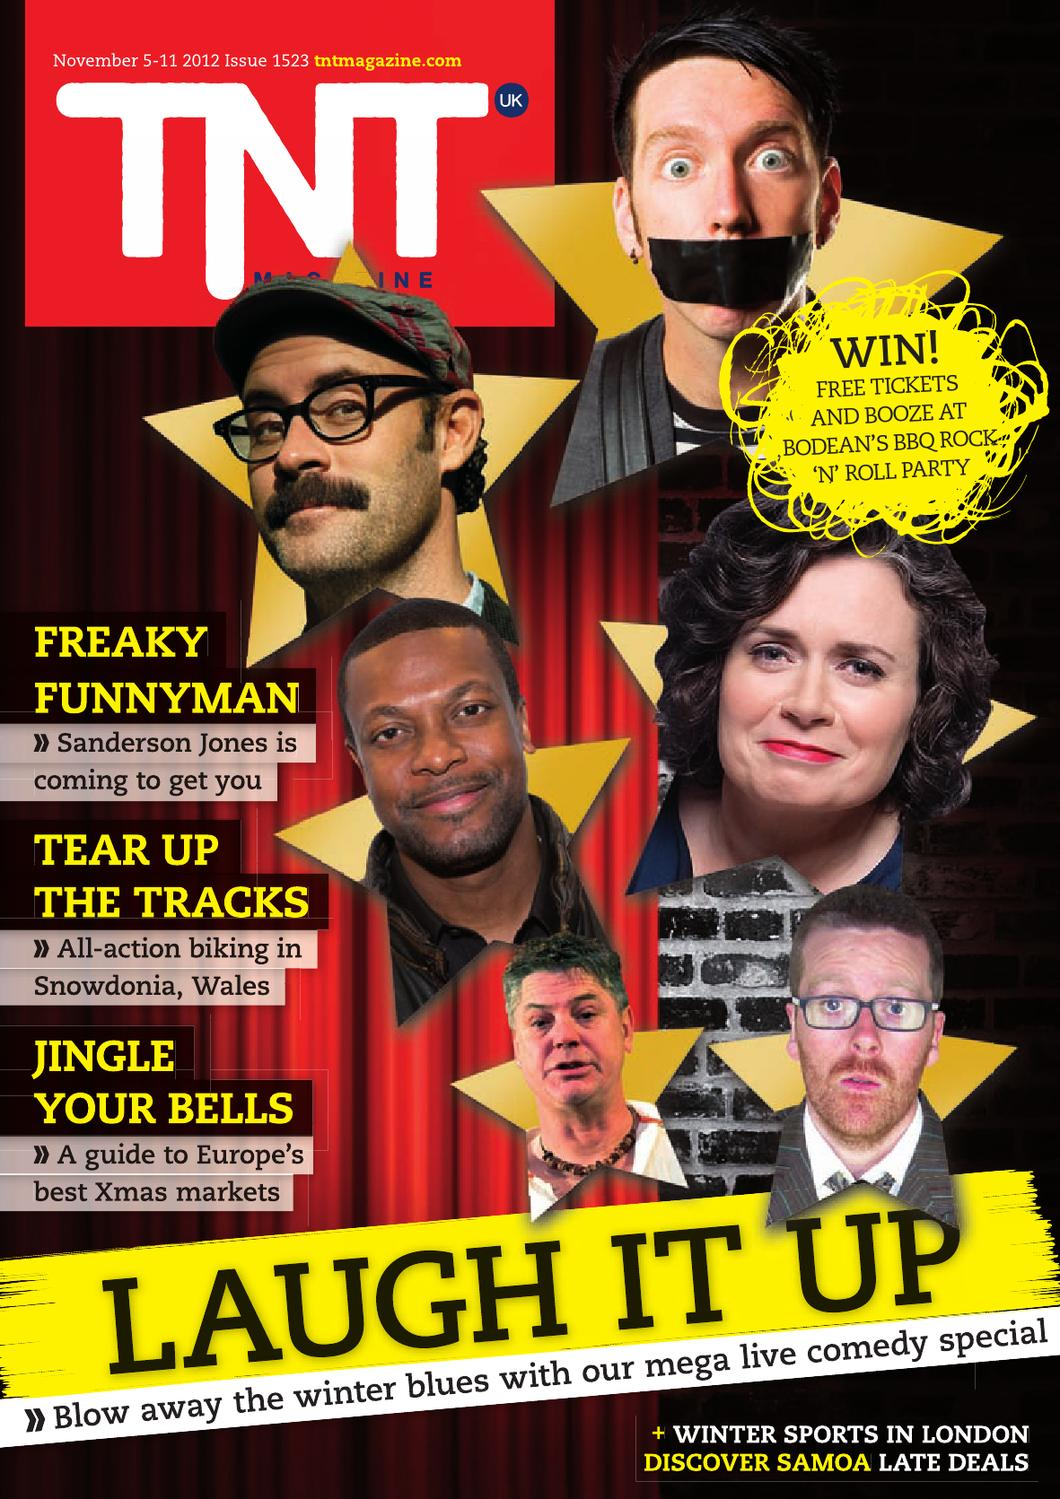 TNT Magazine / Issue 1523 by TNT Magazine - issuu